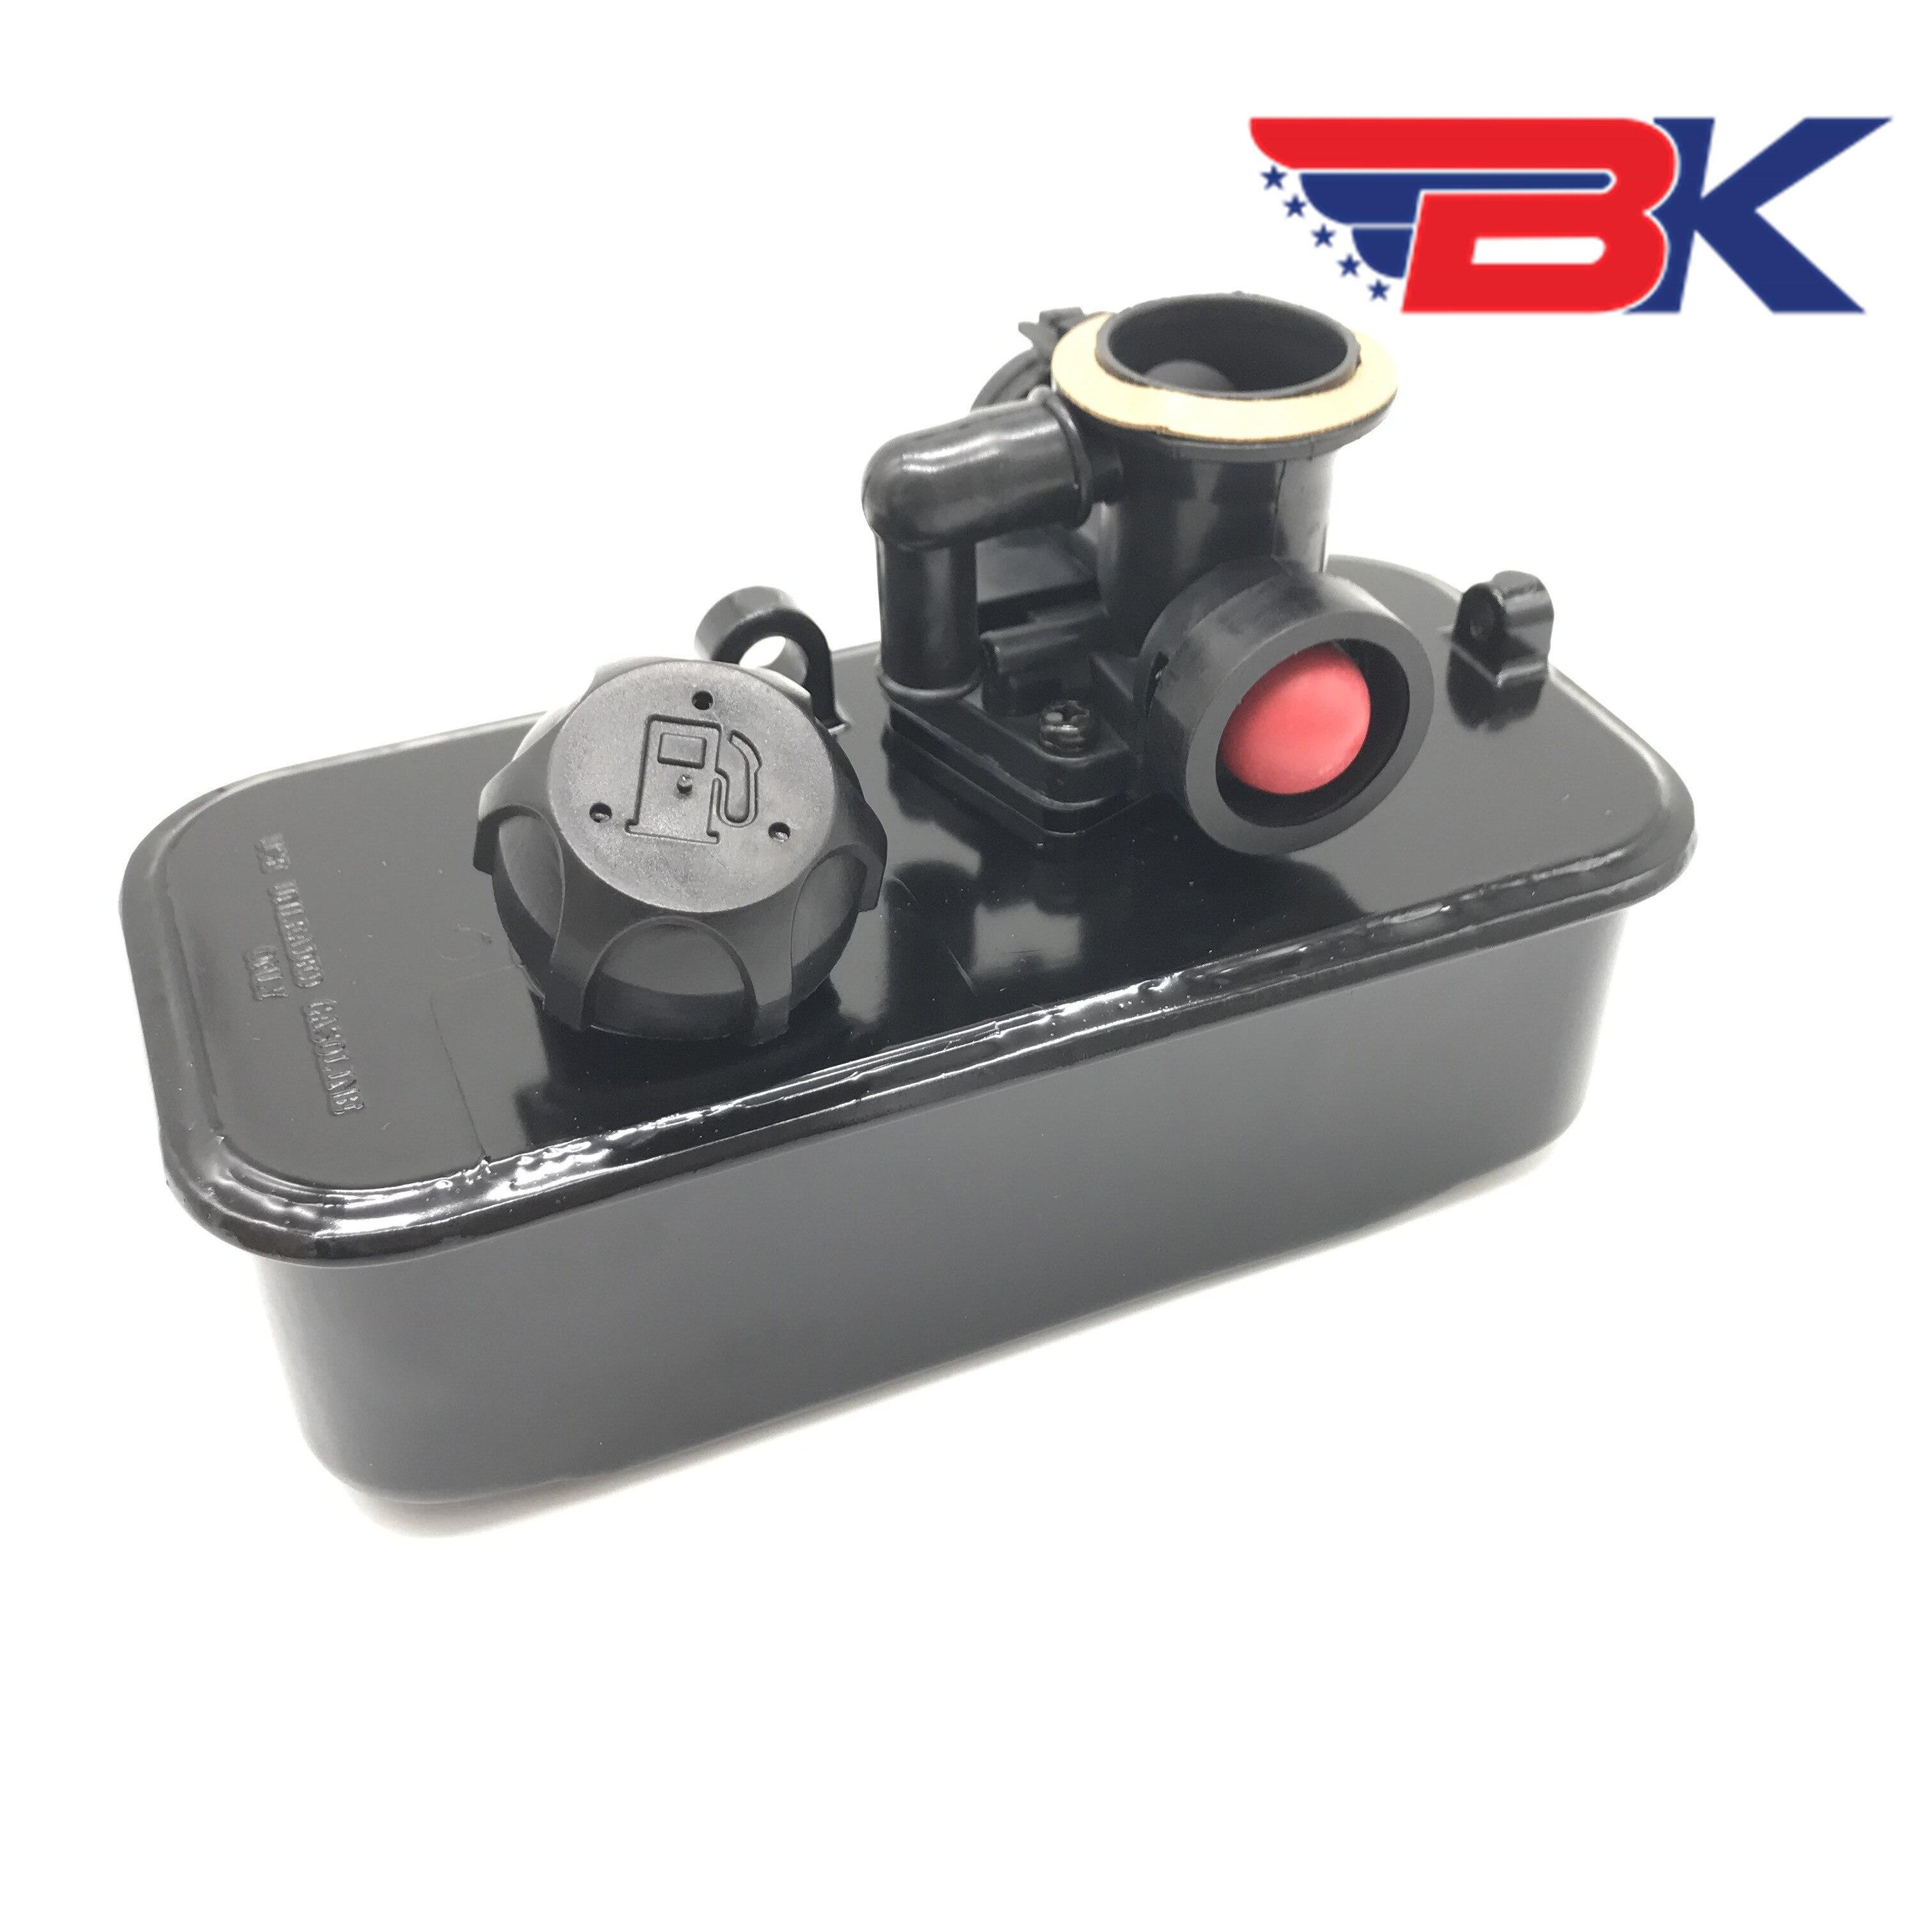 Carburetor Assembly & Fuel GAS TANK For Briggs & Stratton 499809 498809A 494406